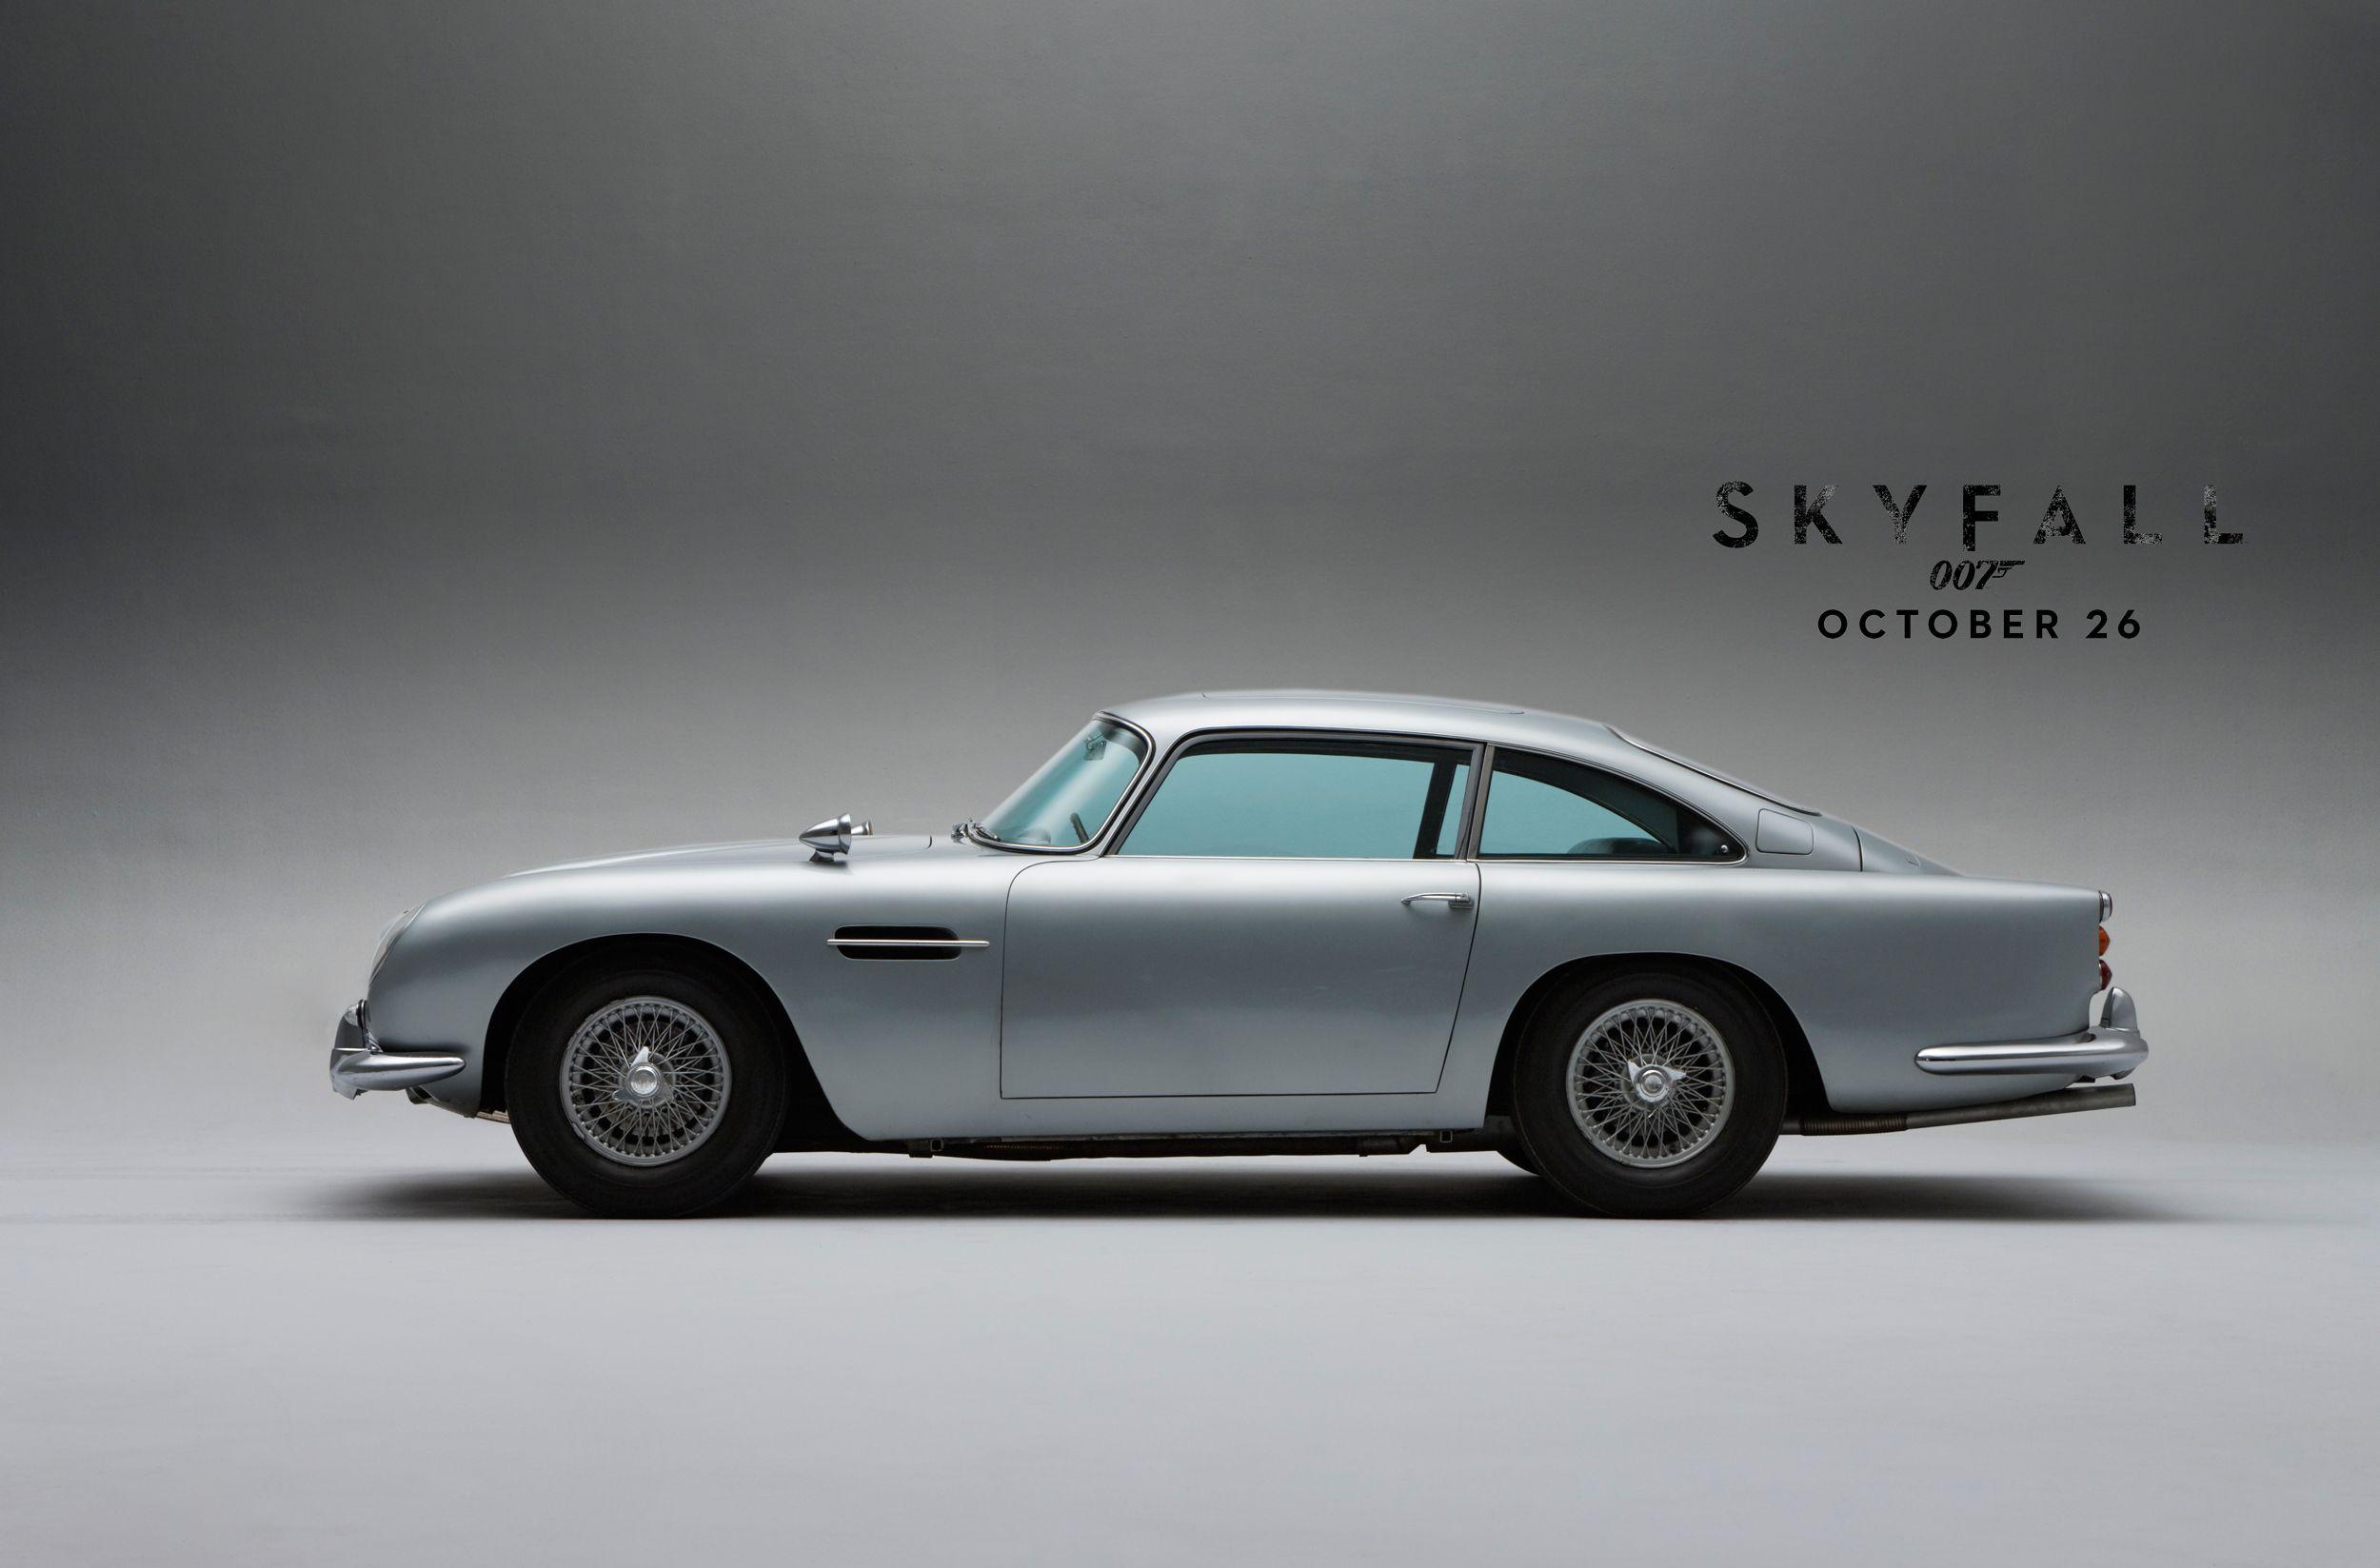 Skyfall   DB5. Learn More At Http://www.astonmartin.com/007 #AstonMartin  #JamesBond #007